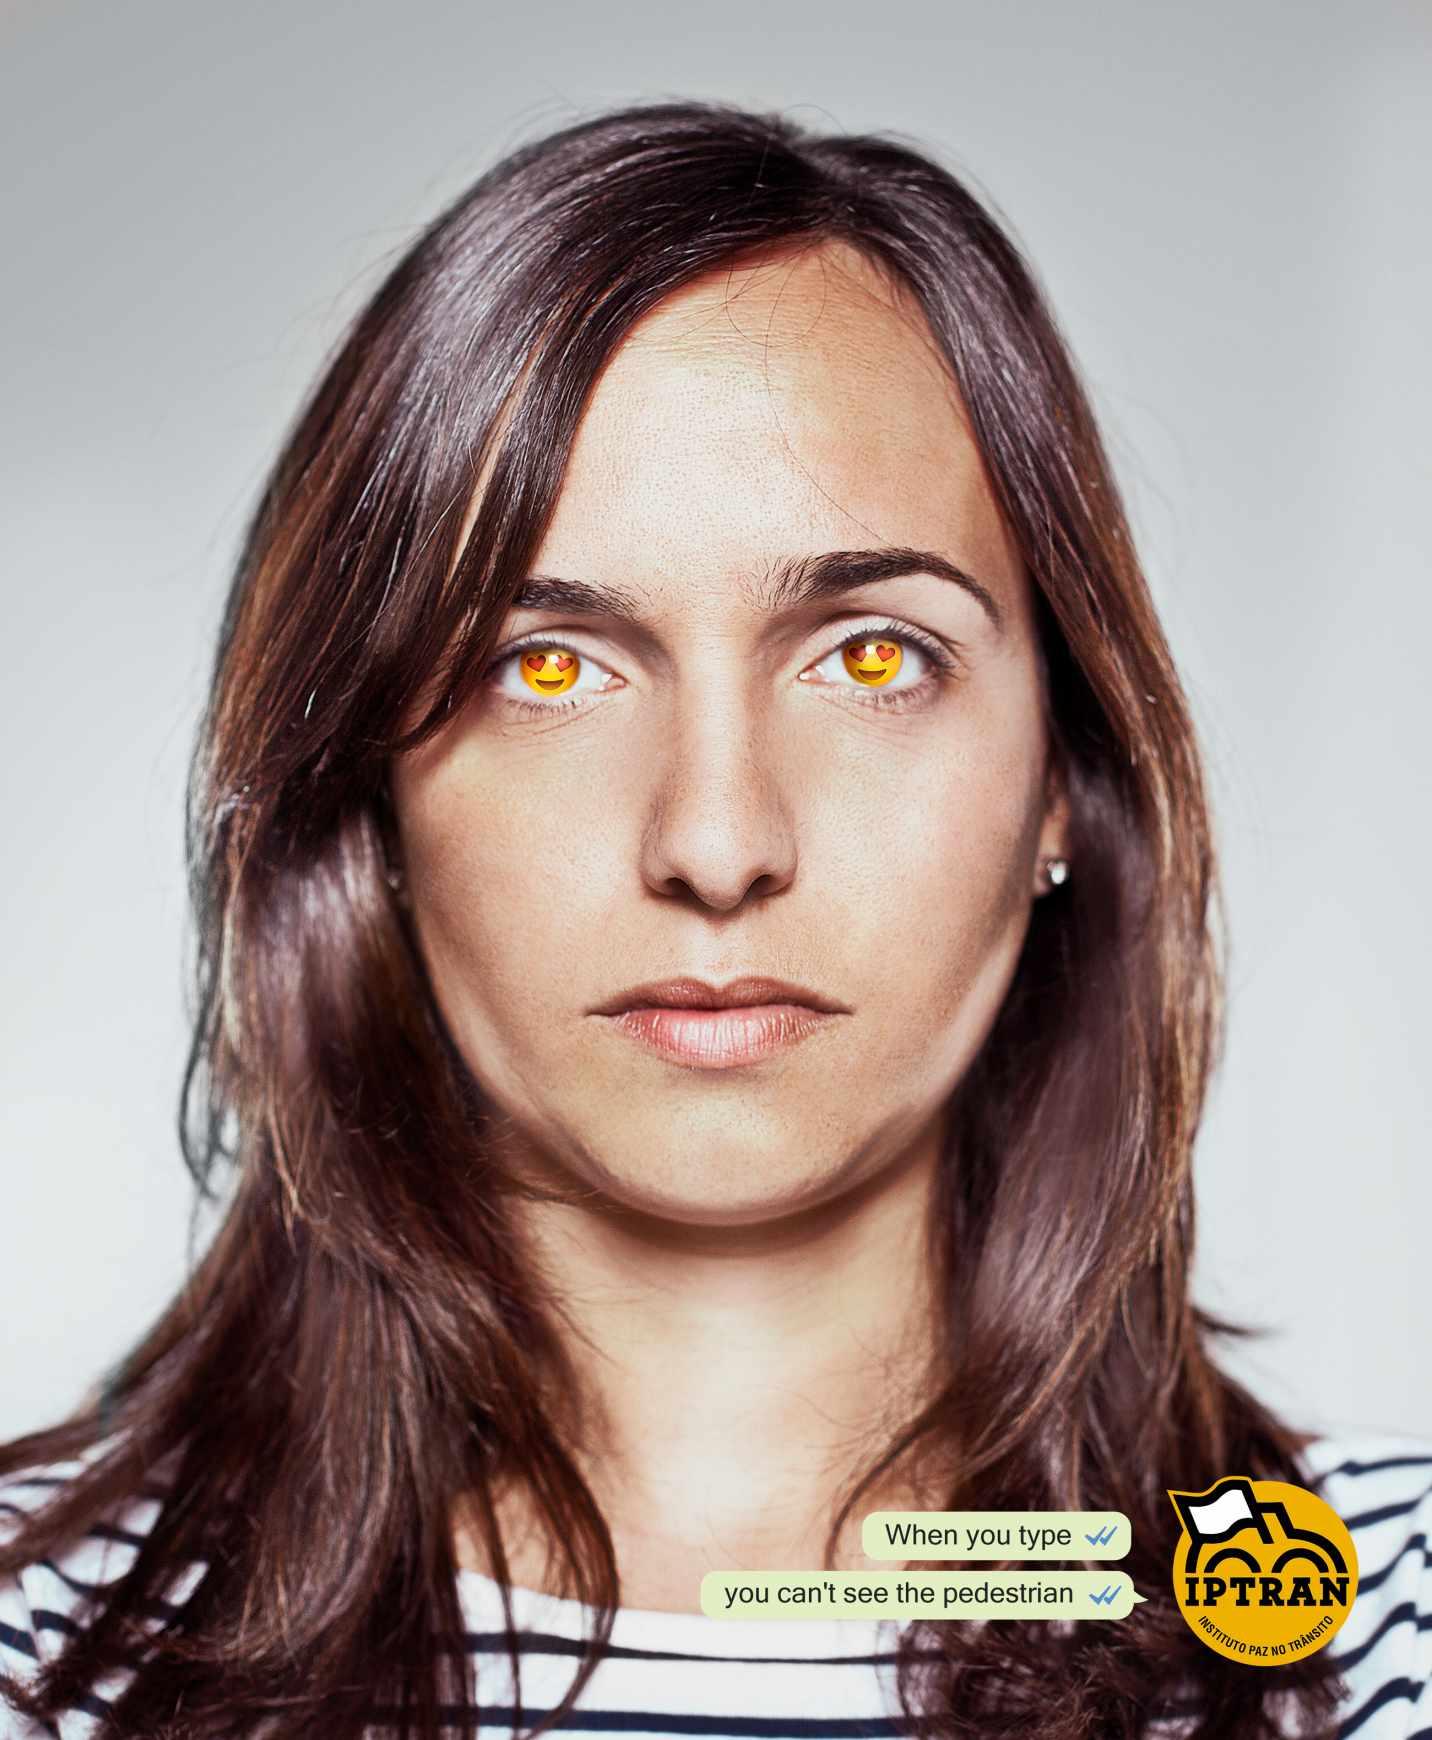 IPTRAN Print Ad - Emoji Eyes, 1